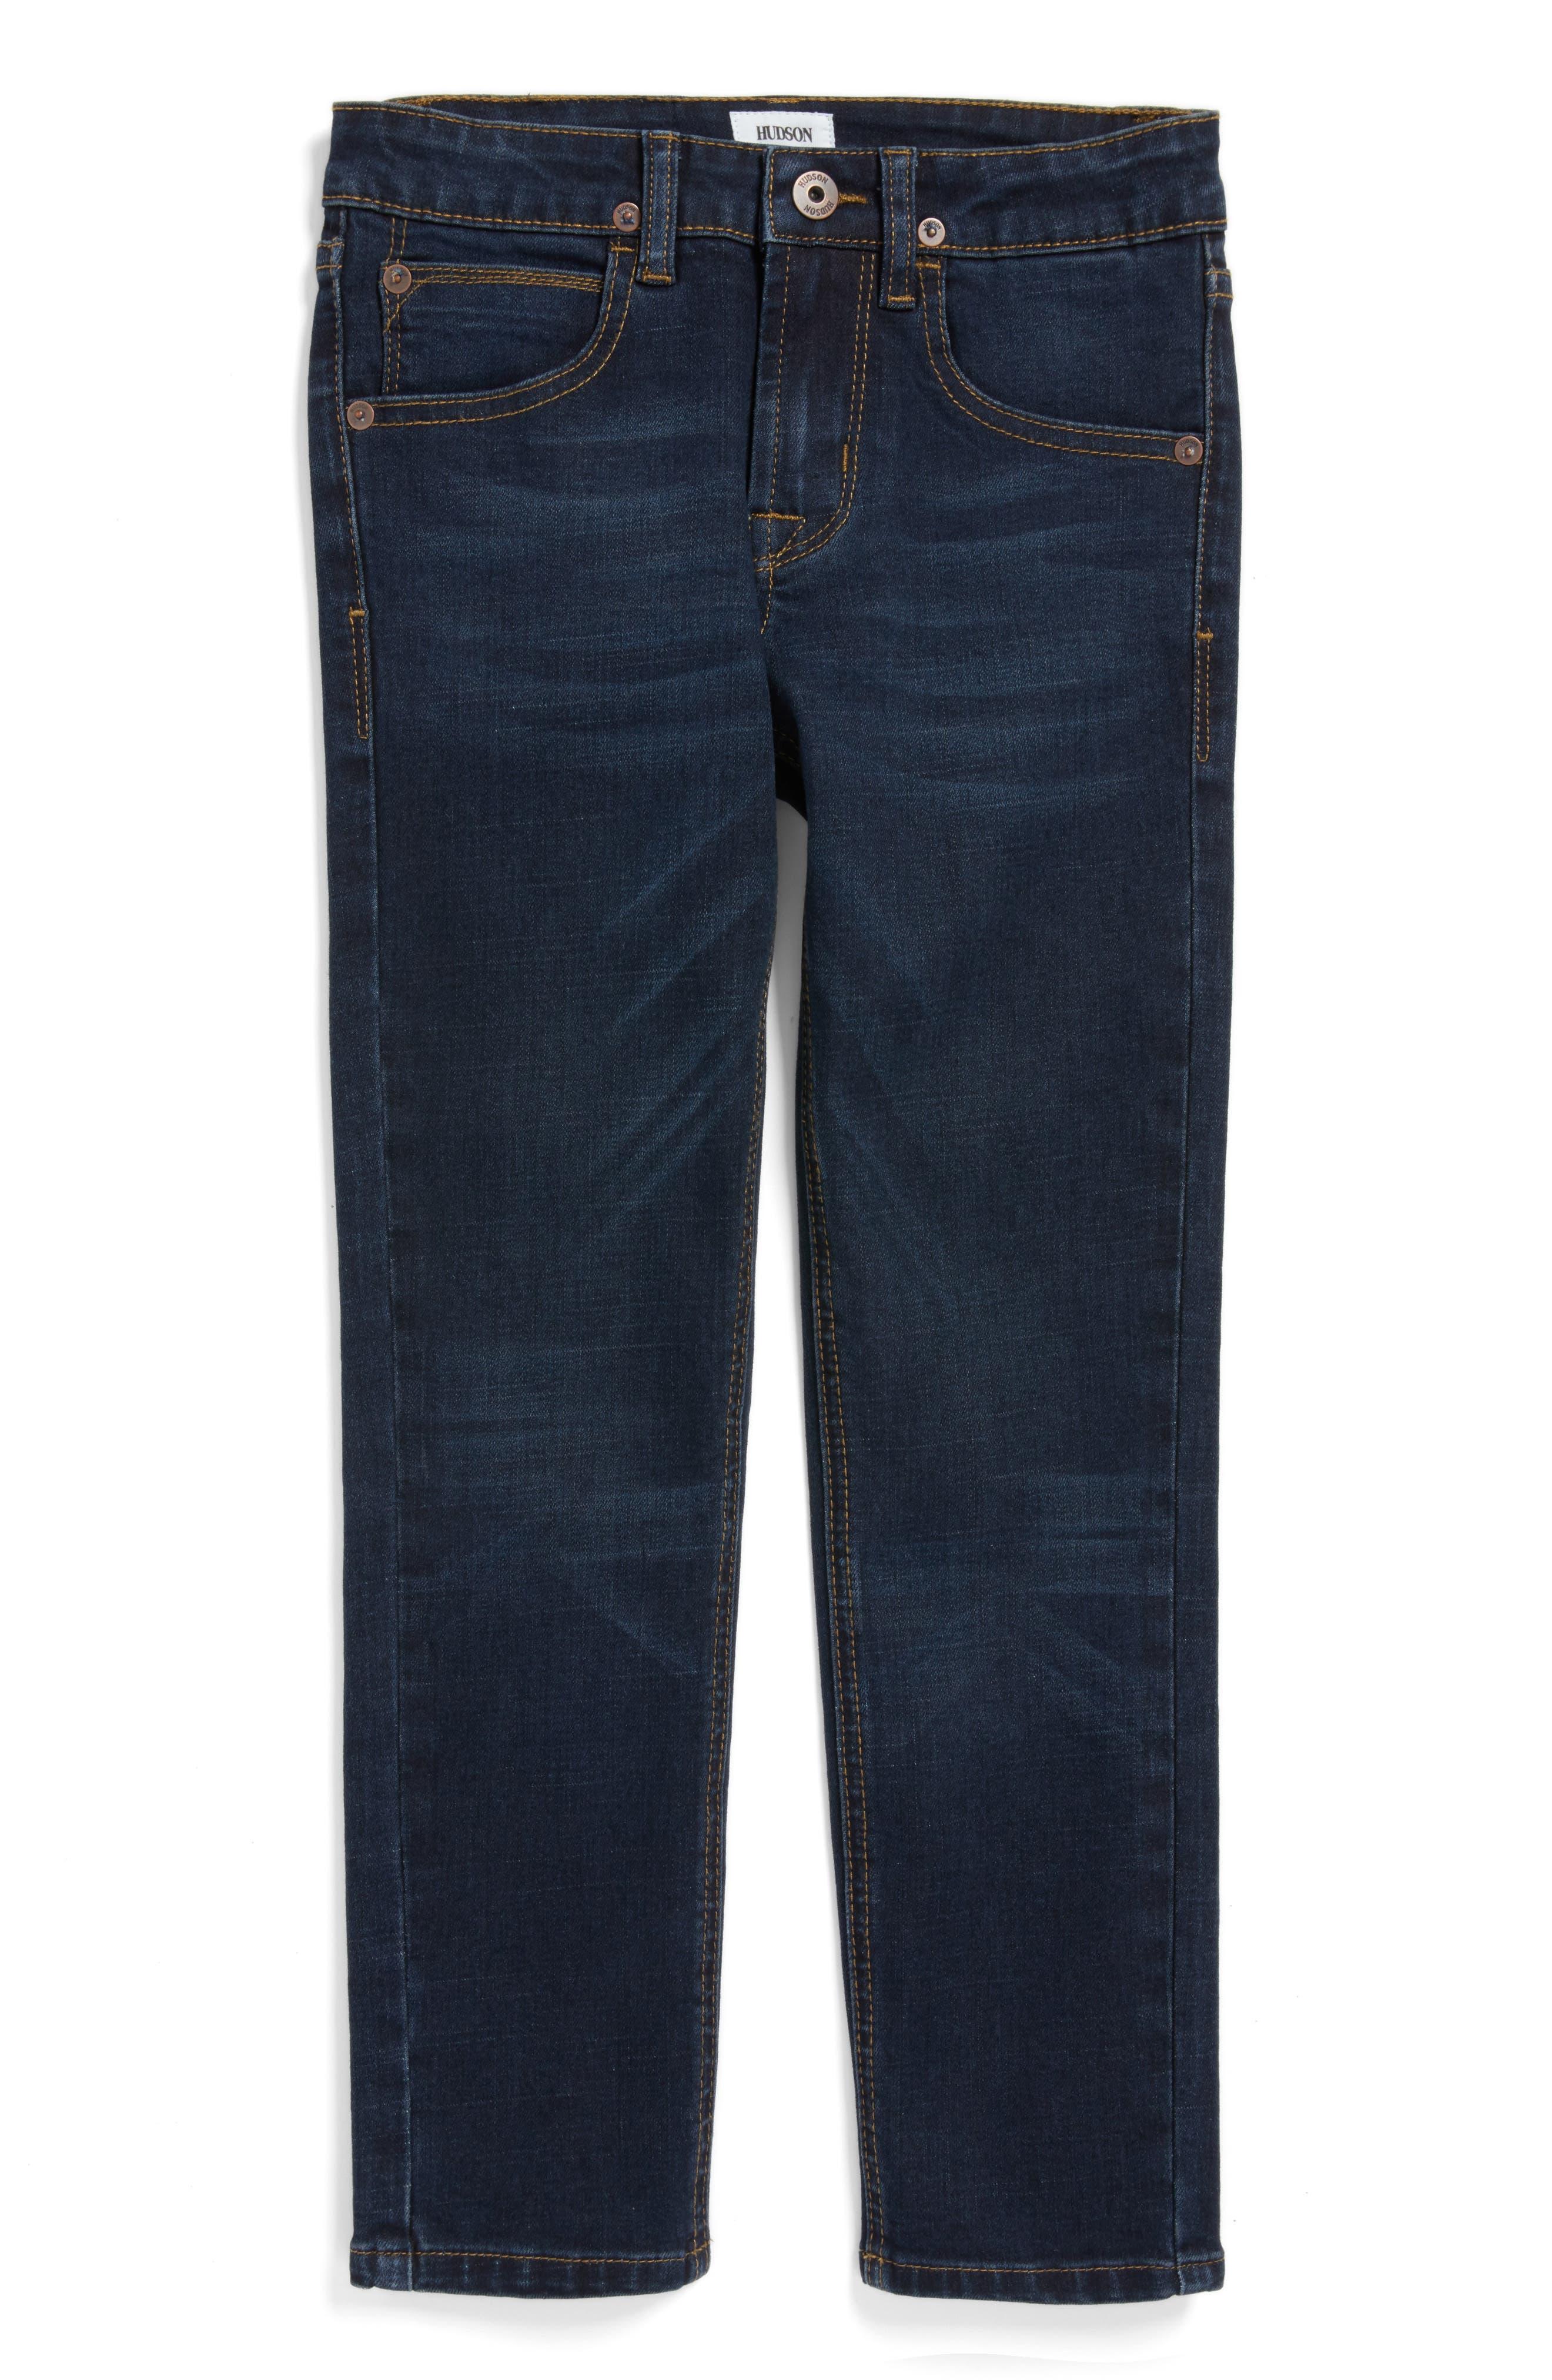 Main Image - Hudson Jagger Slim Straight Leg Jeans (Toddler Boys, Little Boys & Big Boys)